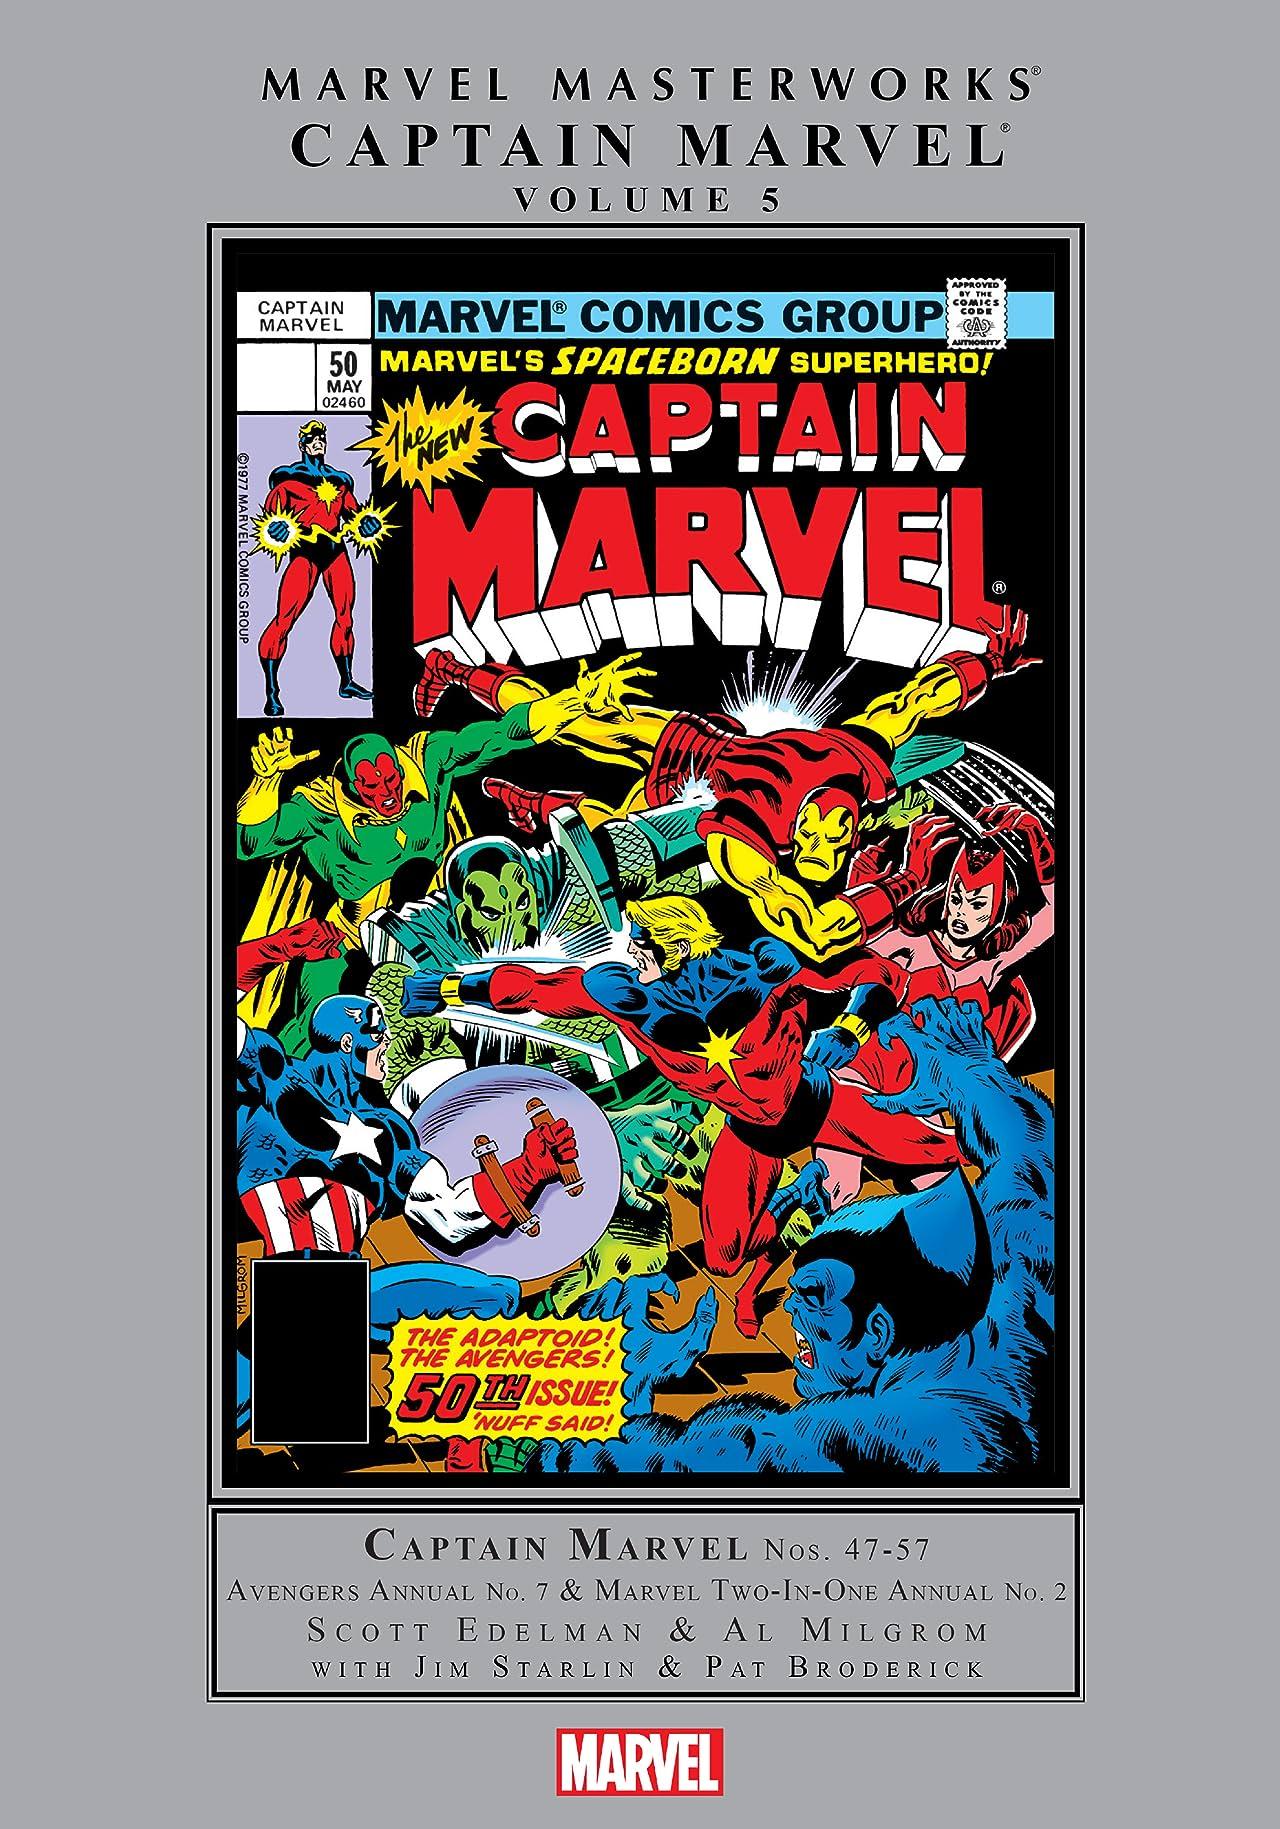 Captain Marvel Masterworks Vol. 5